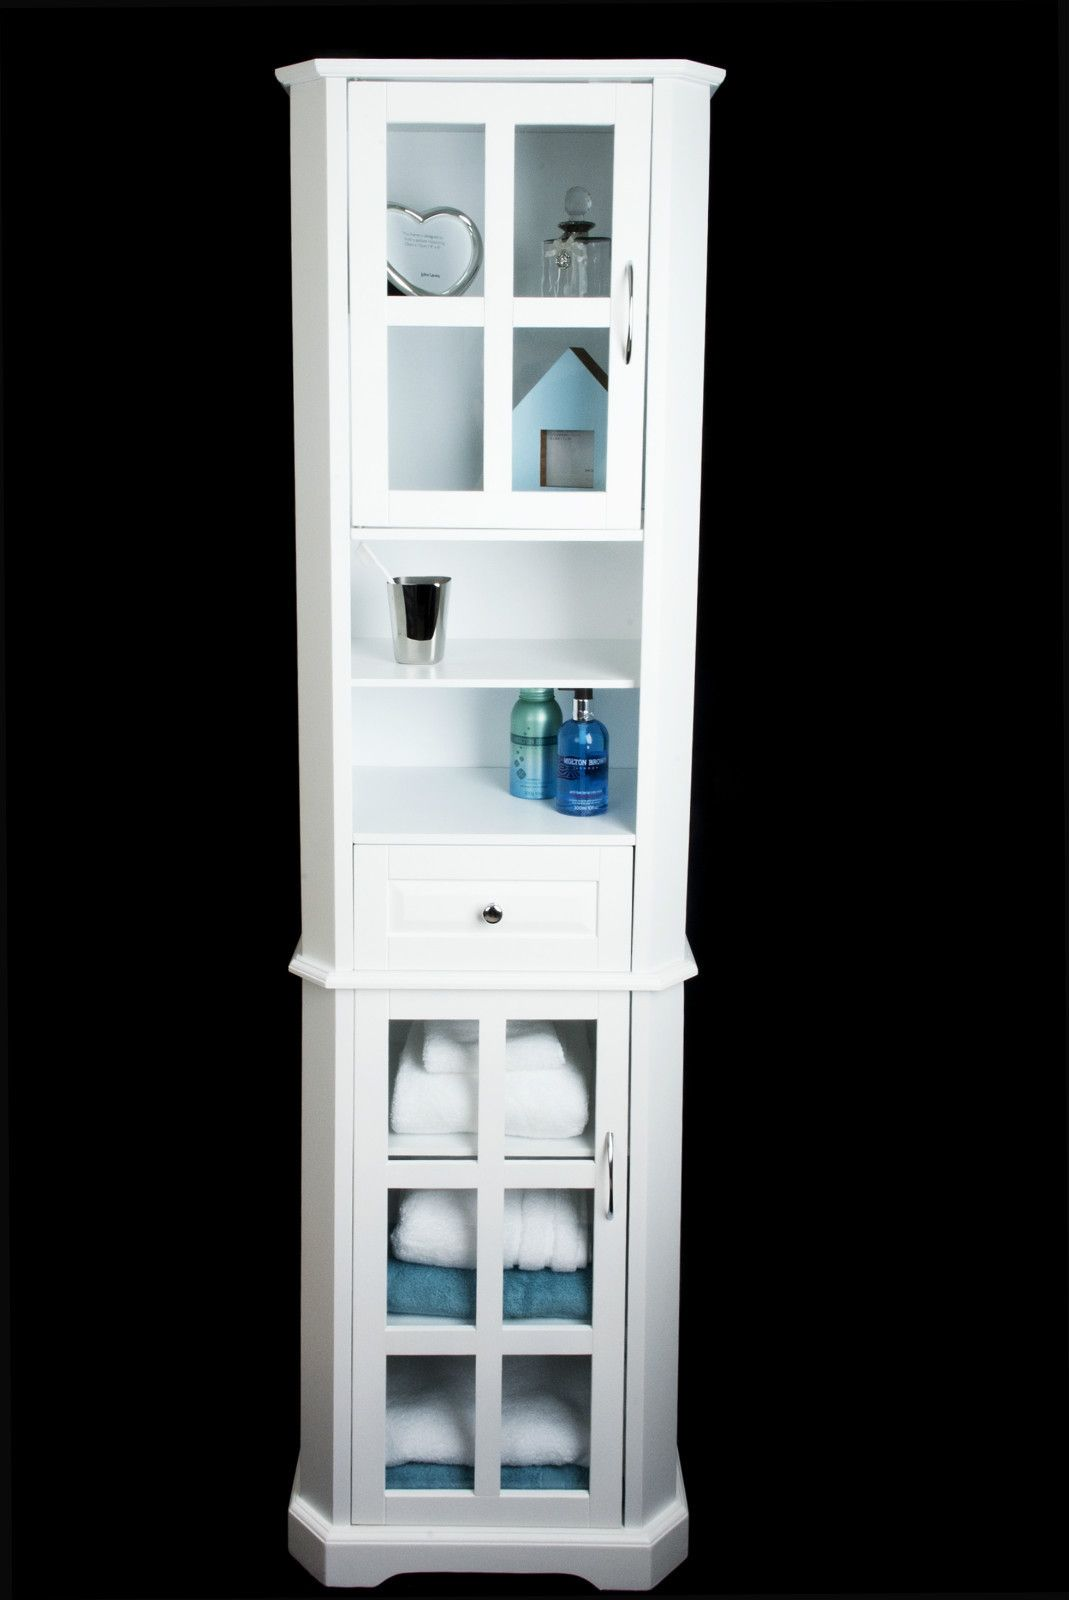 White Wood Storage Cabinet Tall Boy Glazed Bathroom Bedroom Freestanding Wood Storage Cabinets Wood Bedroom Tall White Bathroom Cabinet